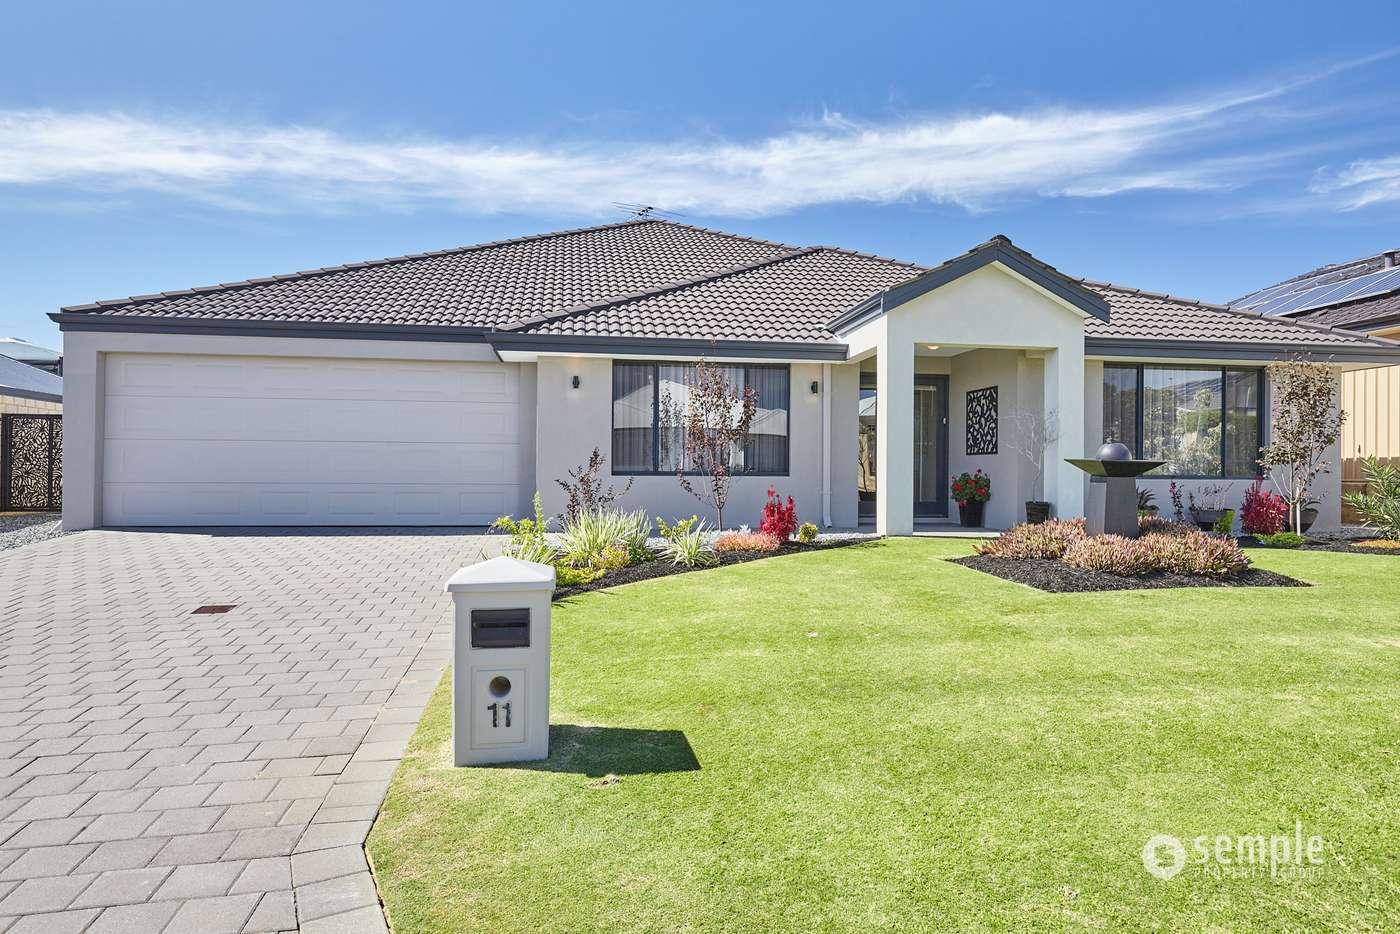 Main view of Homely house listing, 11 Samphire Turn, Beeliar WA 6164